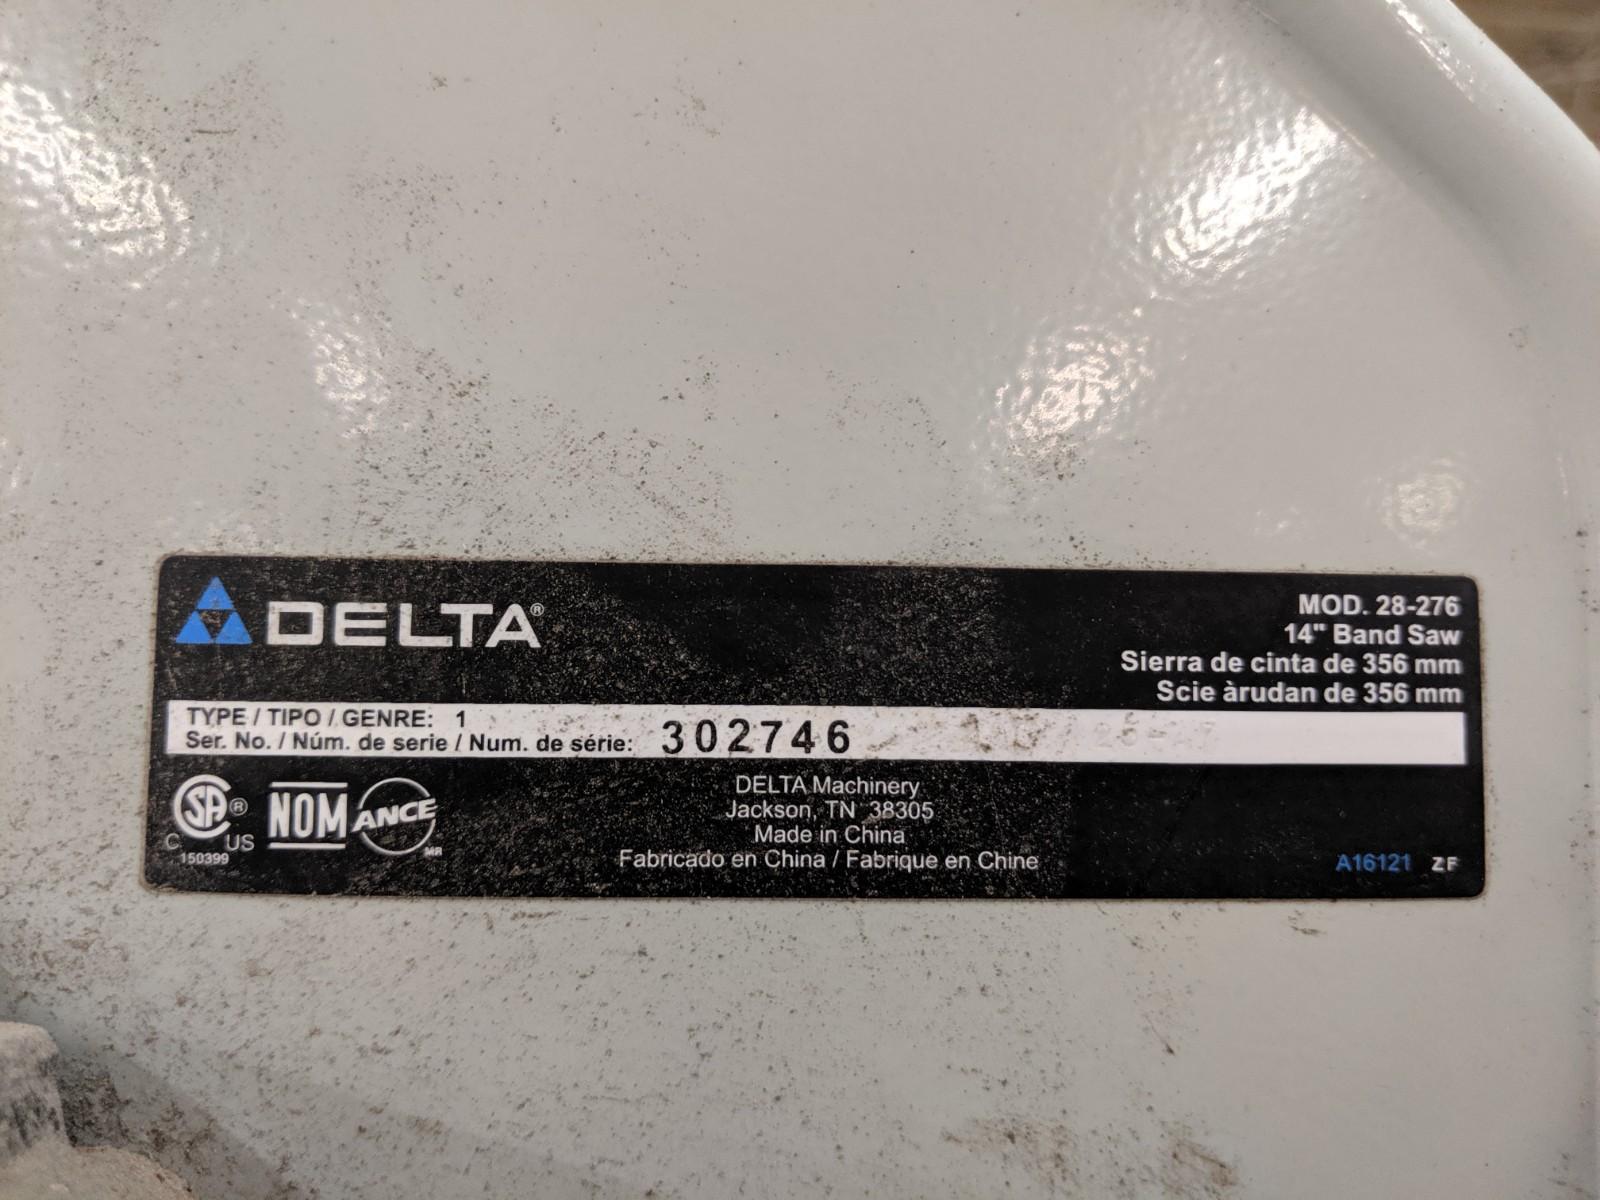 Lot 247 - Delta Band Saw